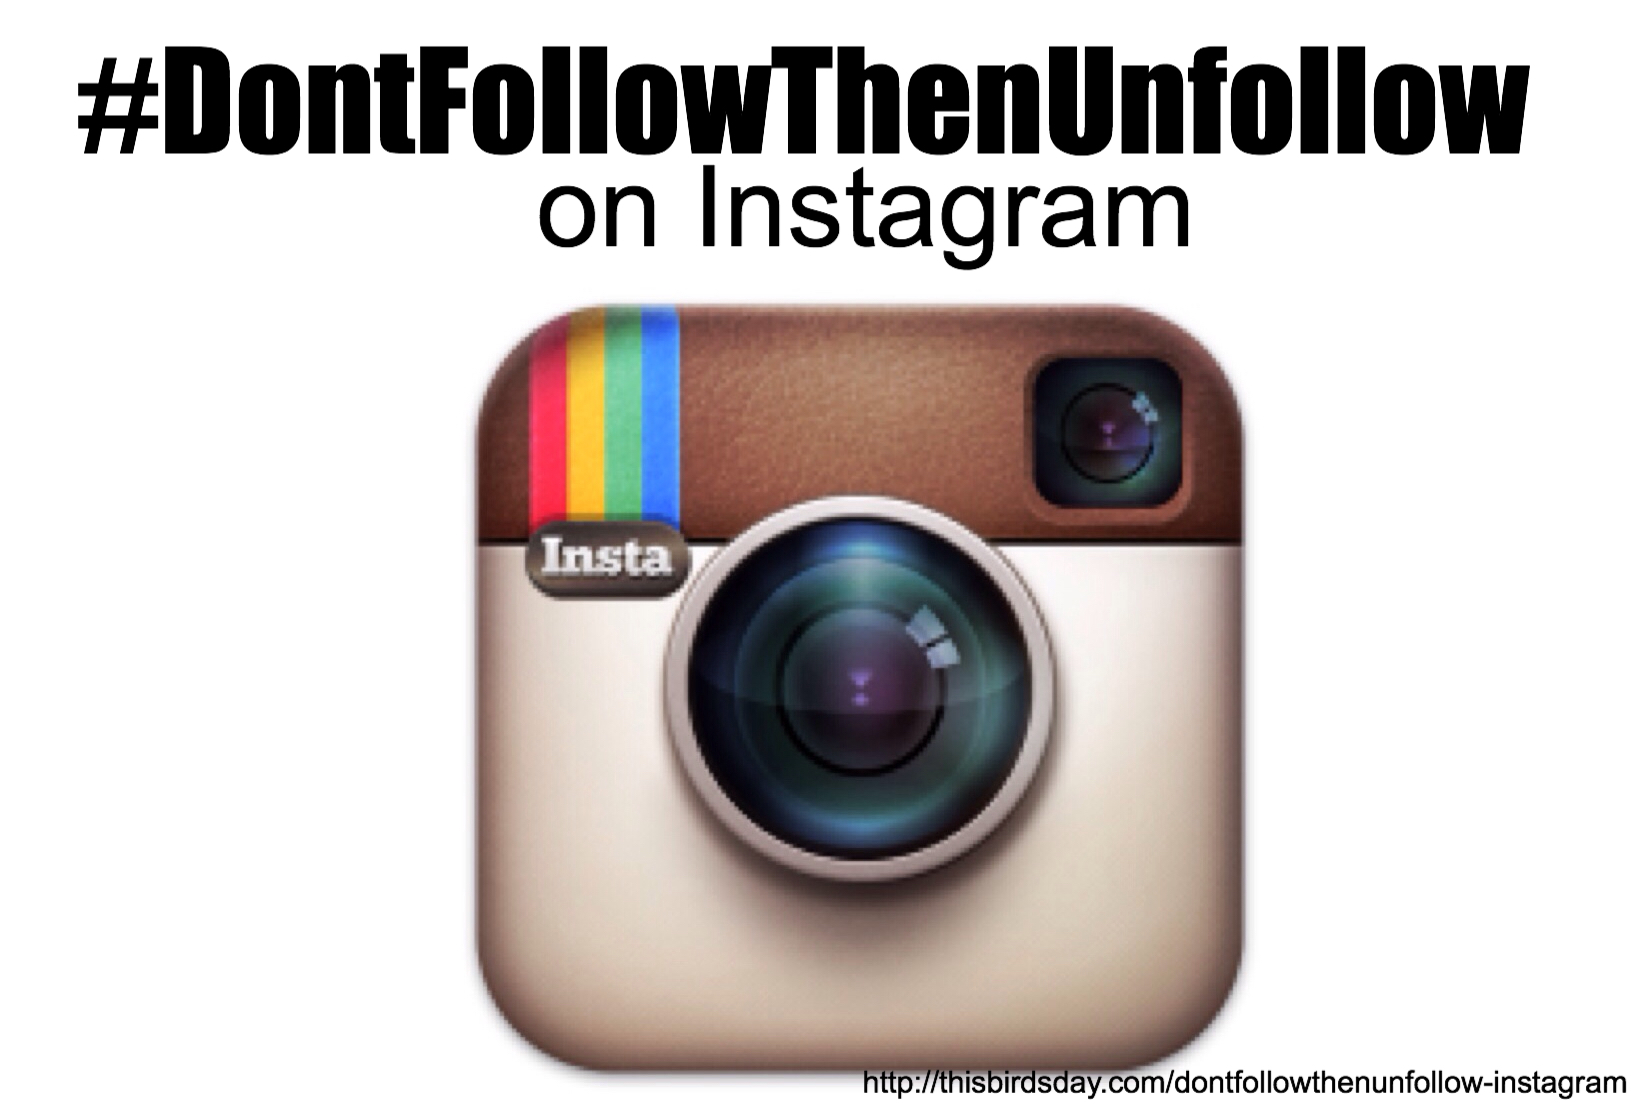 #DontFollowThenUnfollow on Instagram